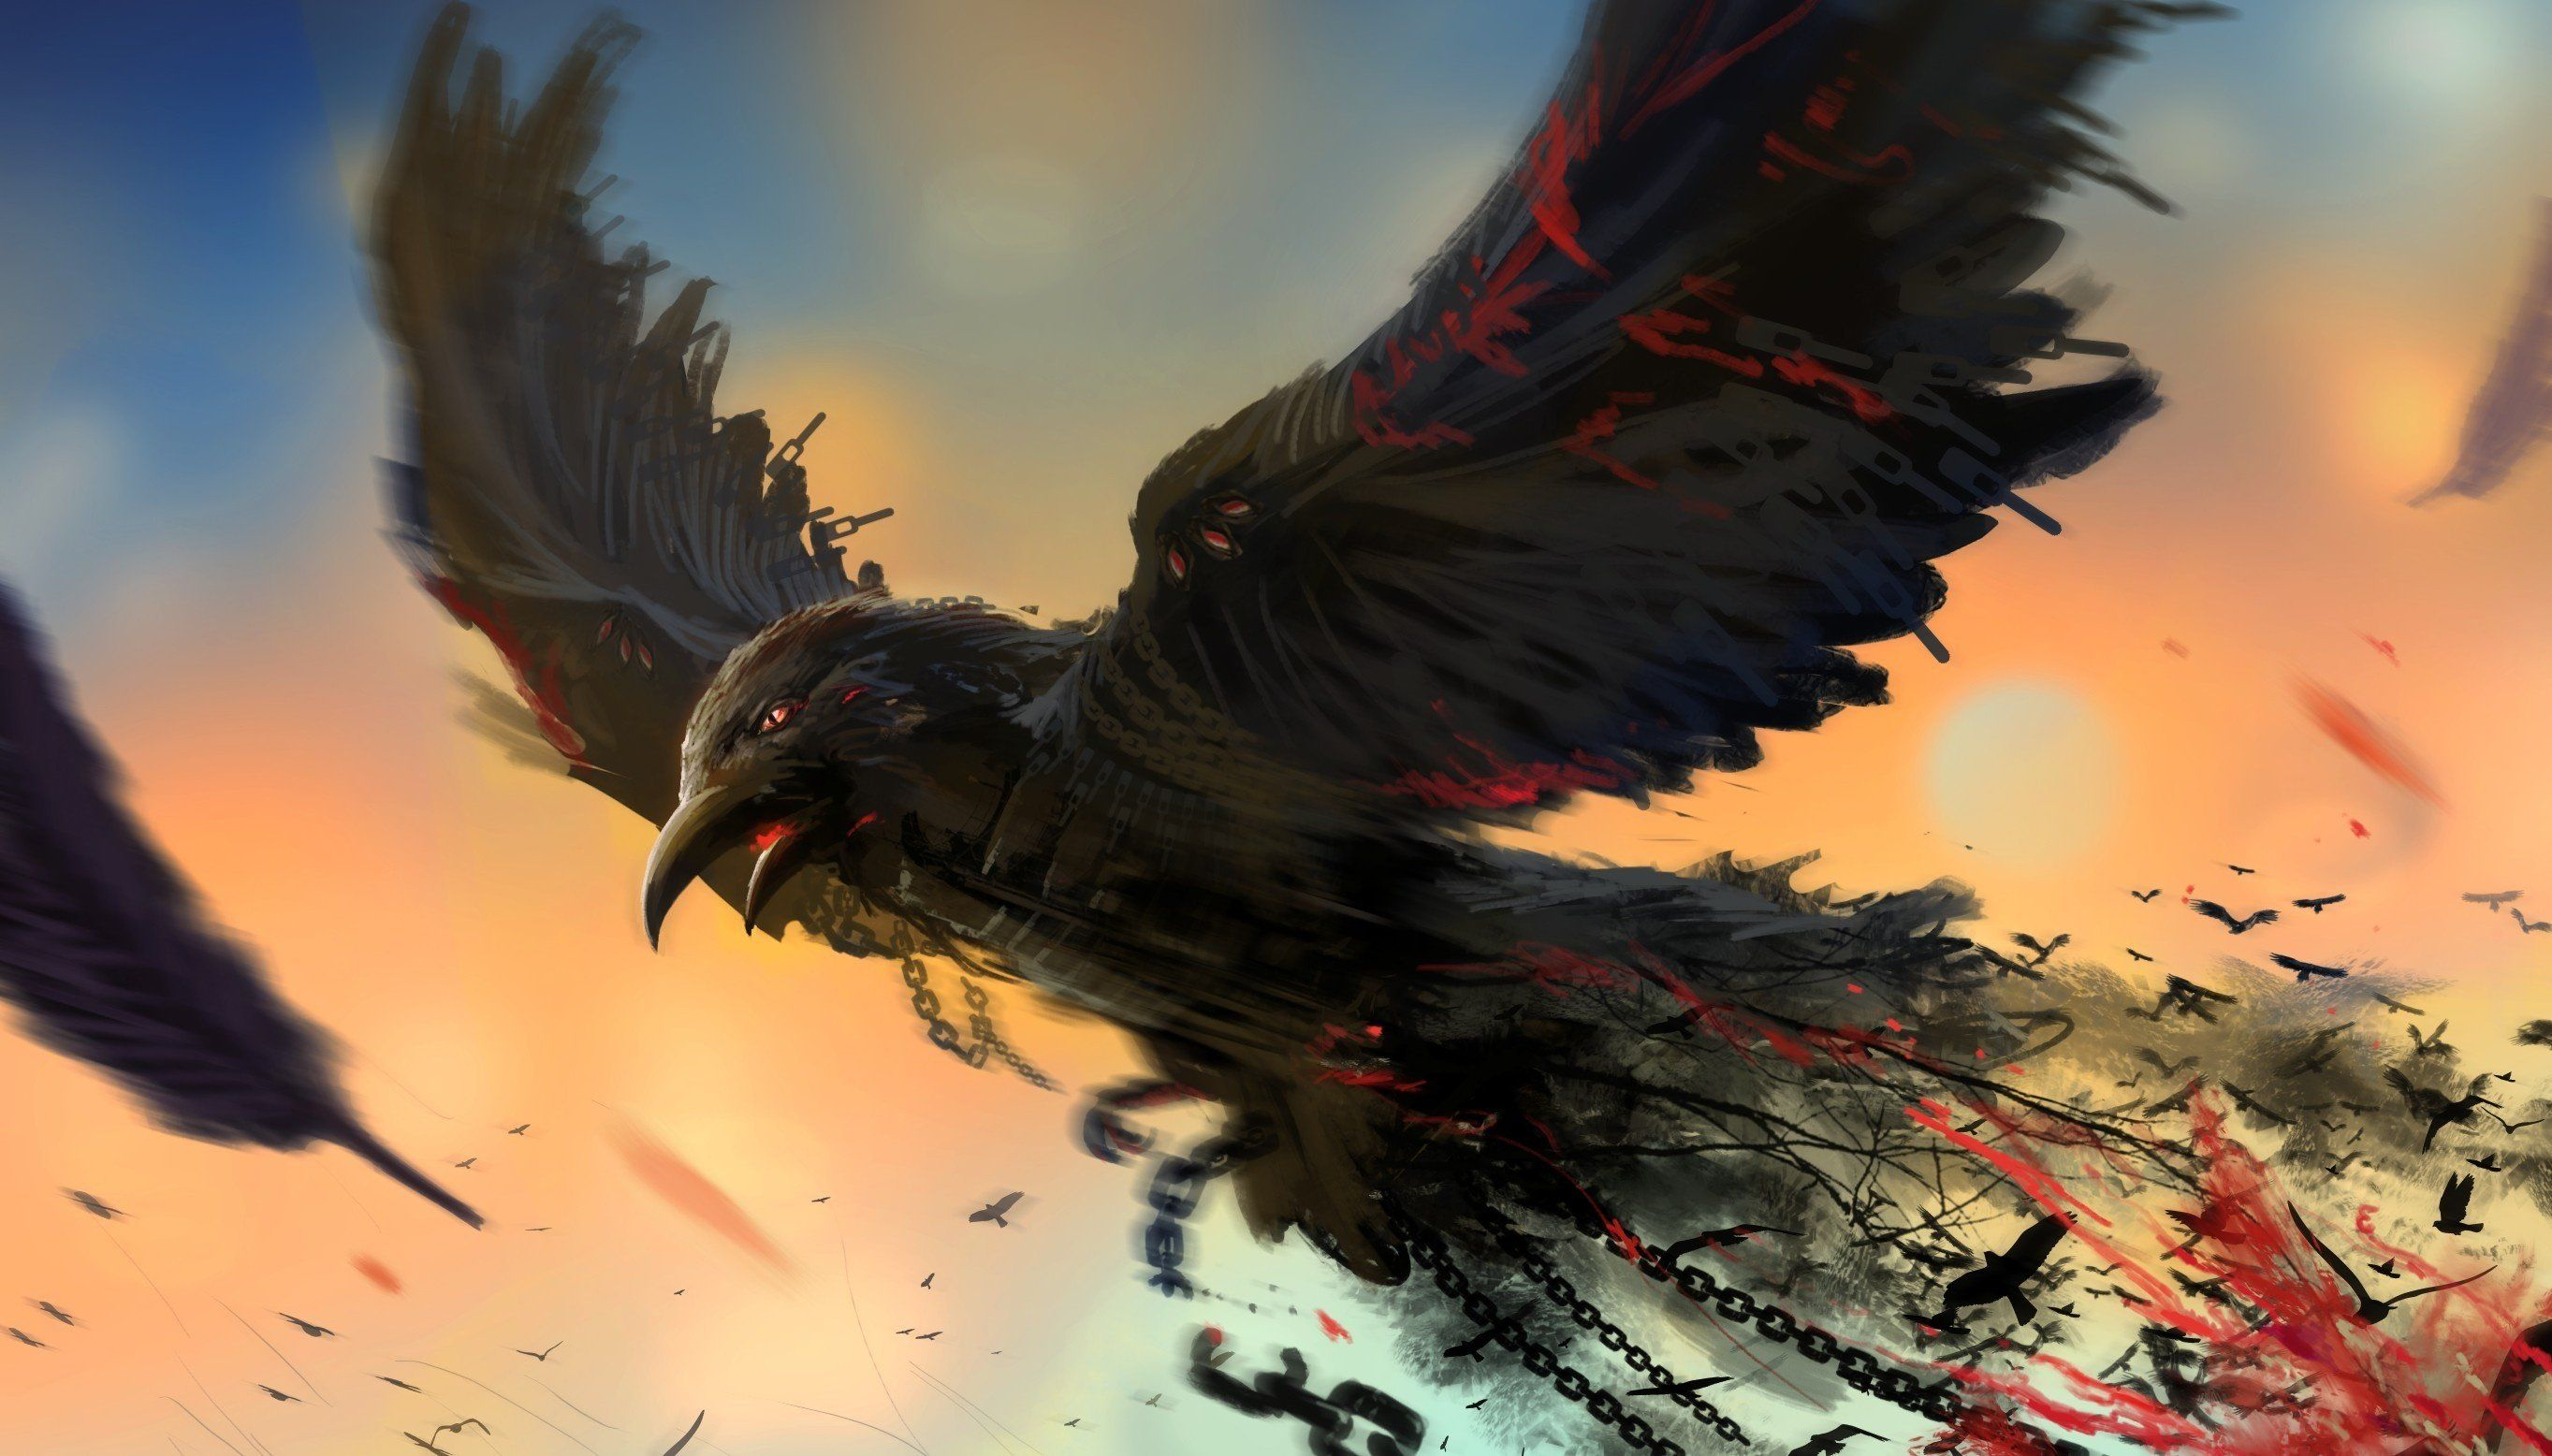 Raven Bird Art bird chain art raven dark blood wallpaper